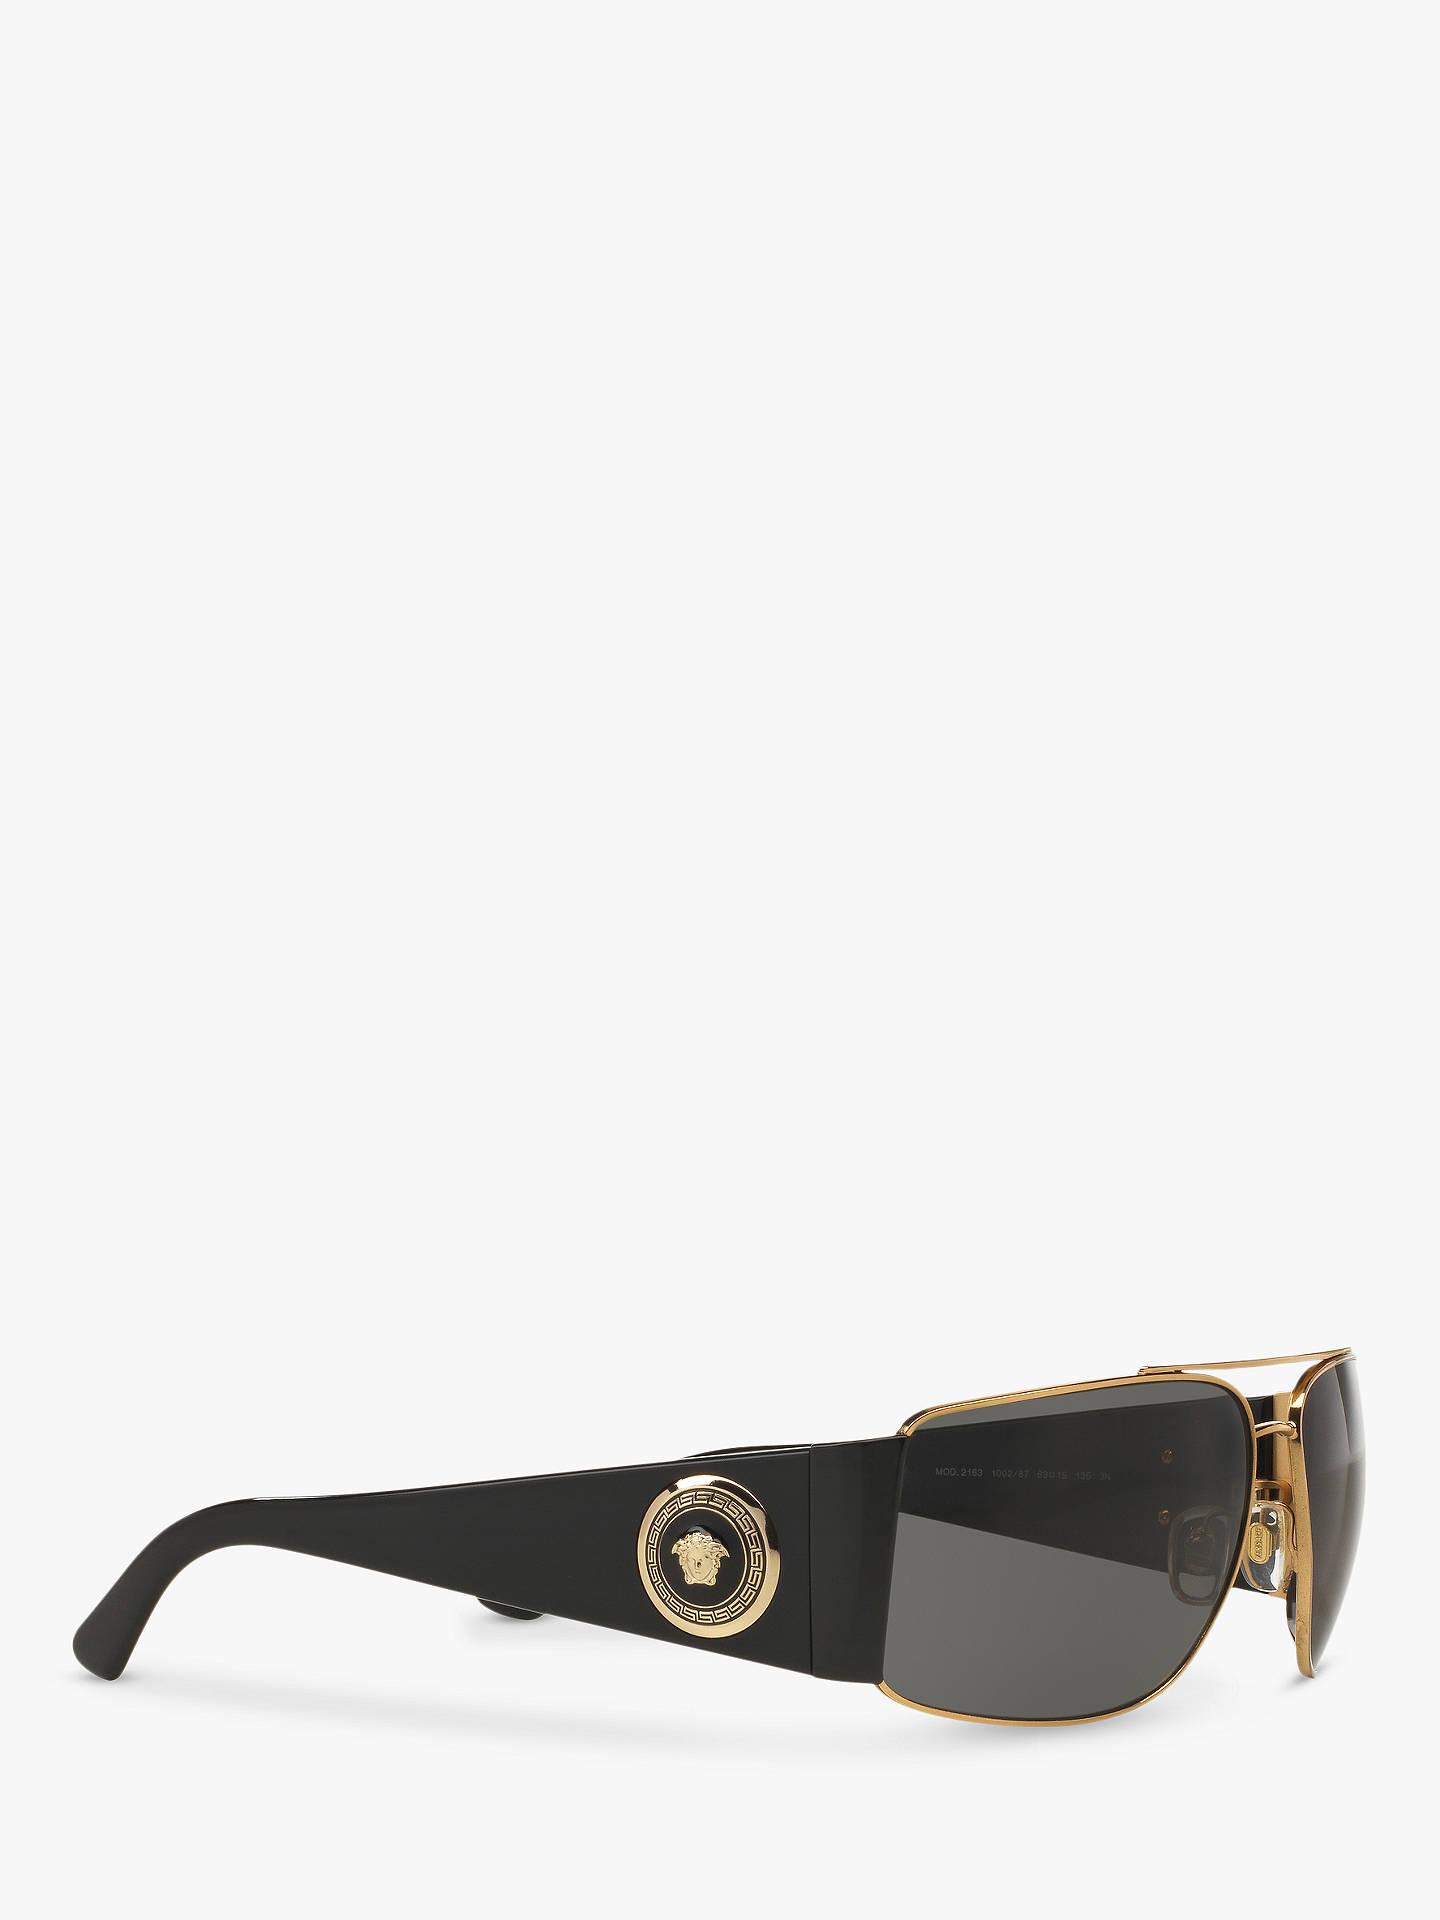 1f8291e667a ... Buy Versace VE2163 Men s Rectangular Sunglasses